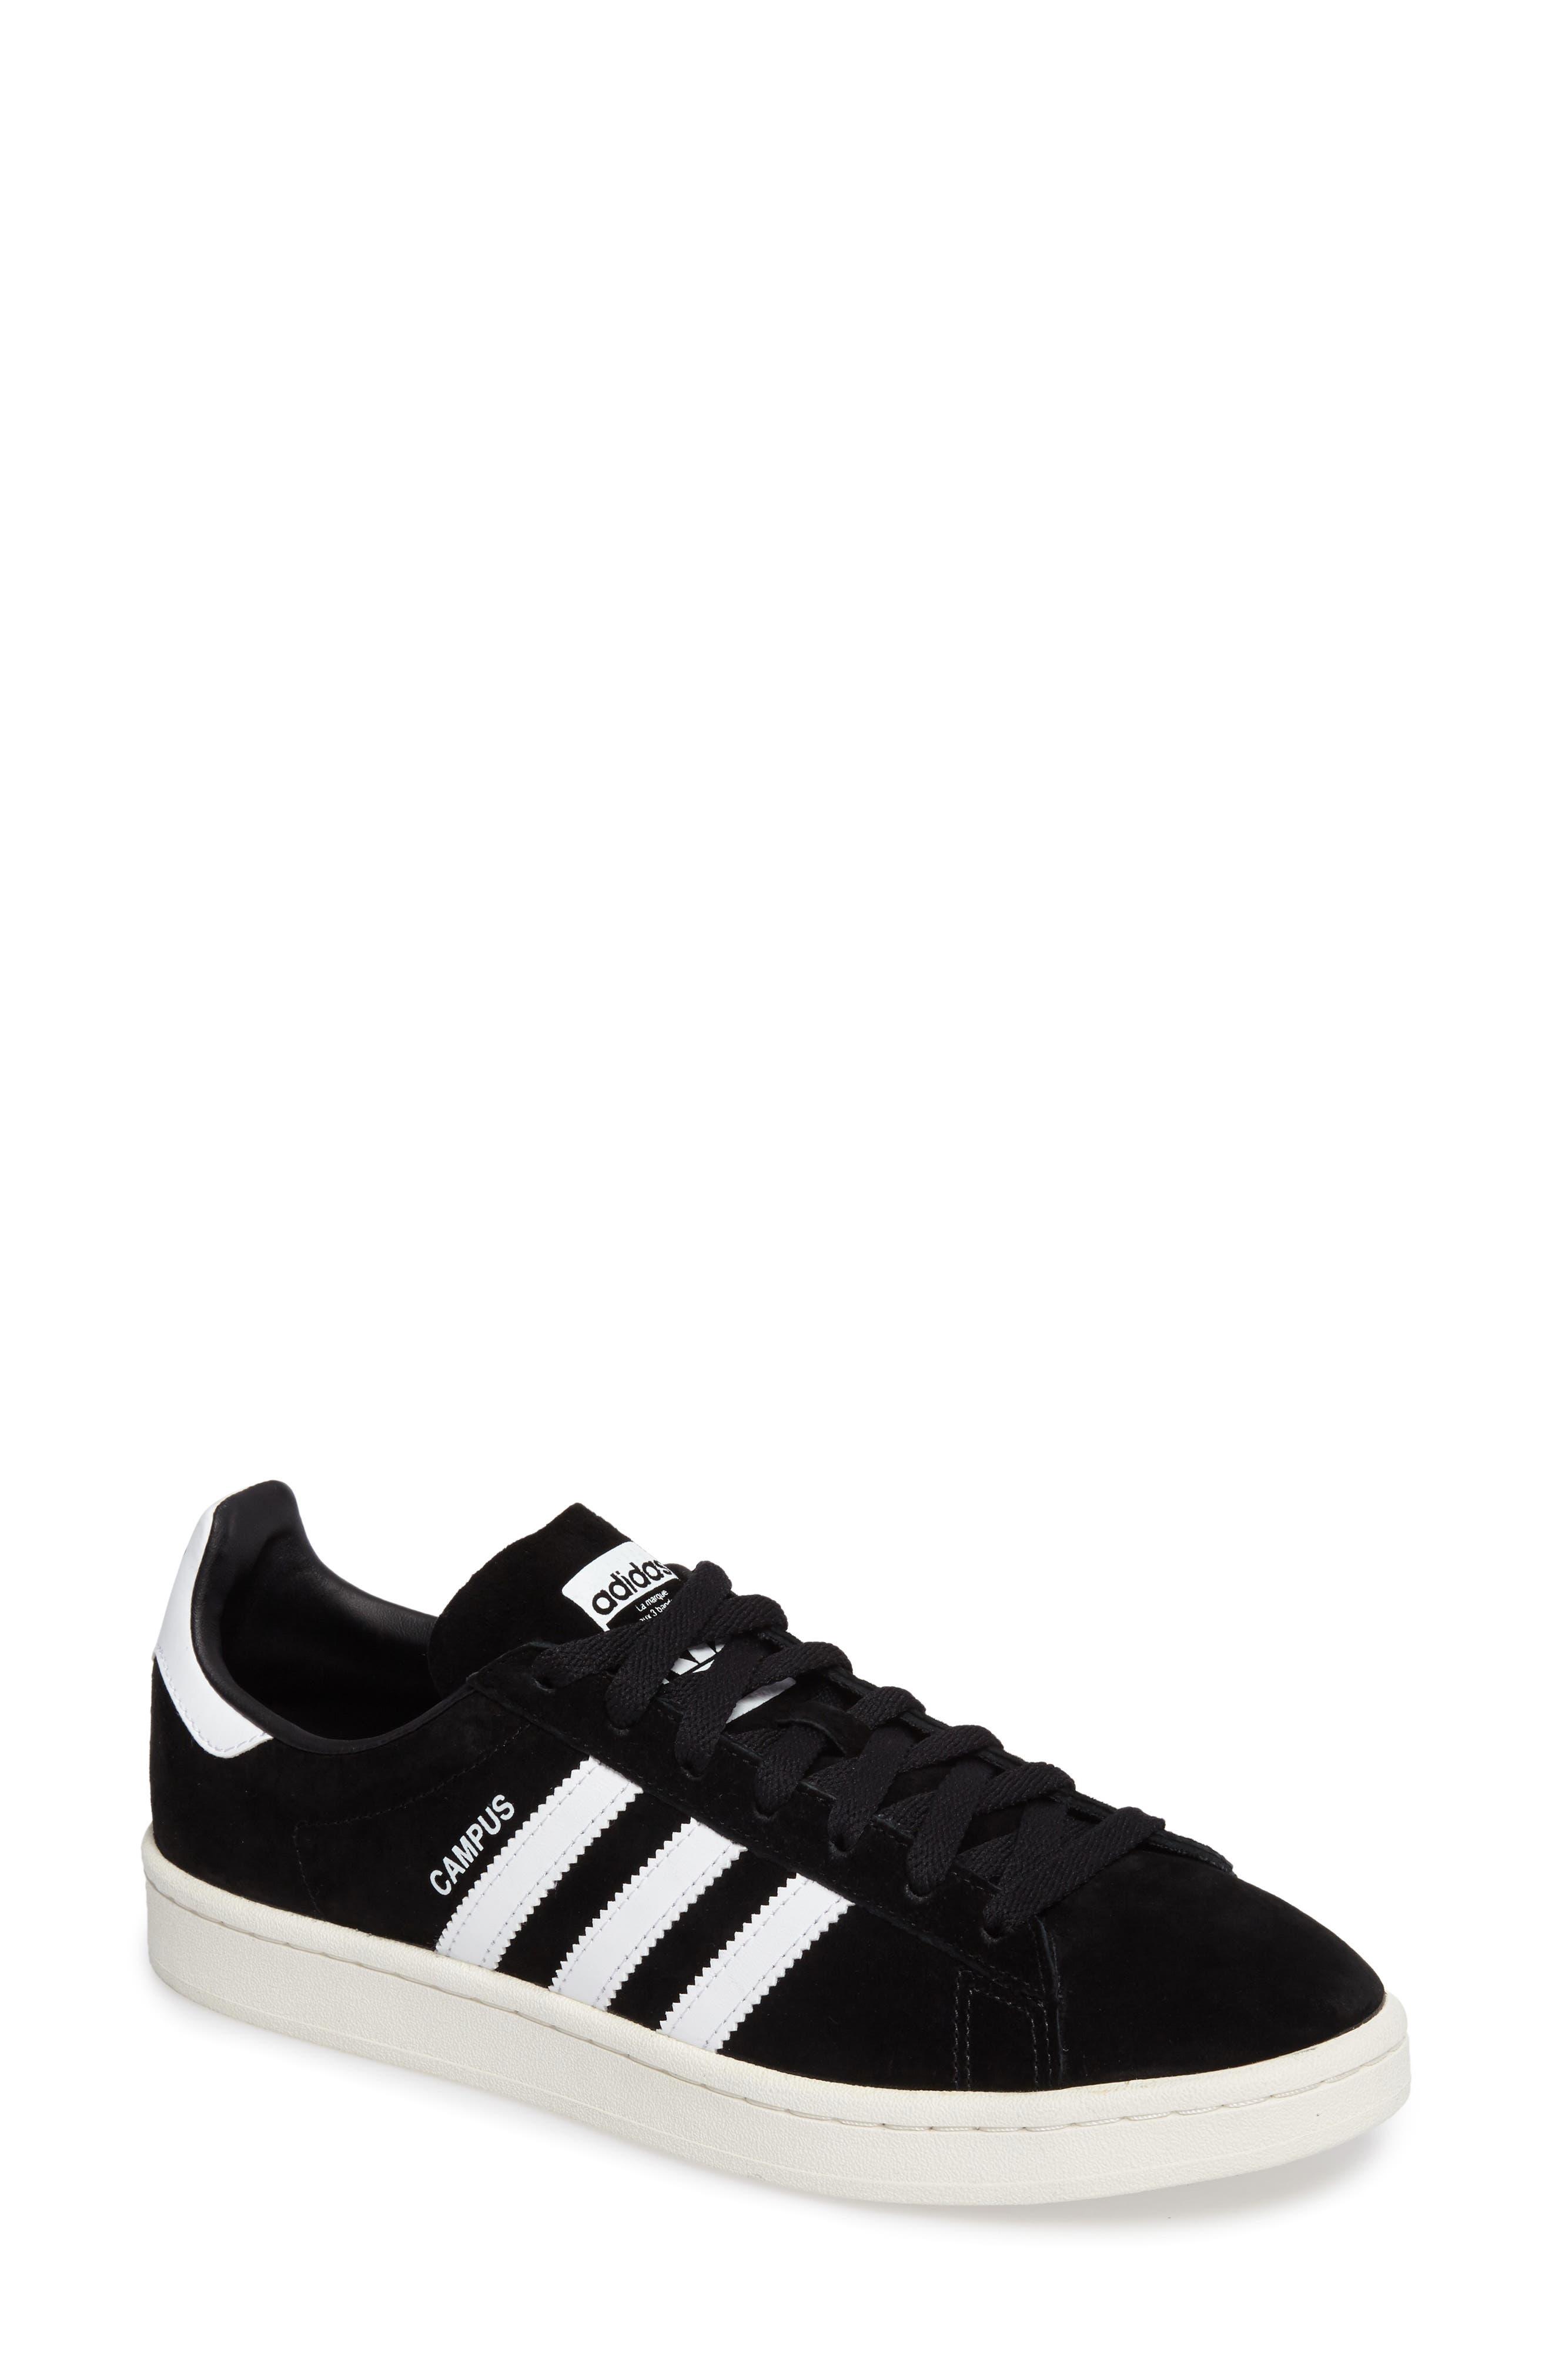 'Campus' Sneaker,                             Main thumbnail 1, color,                             Core Black/ White